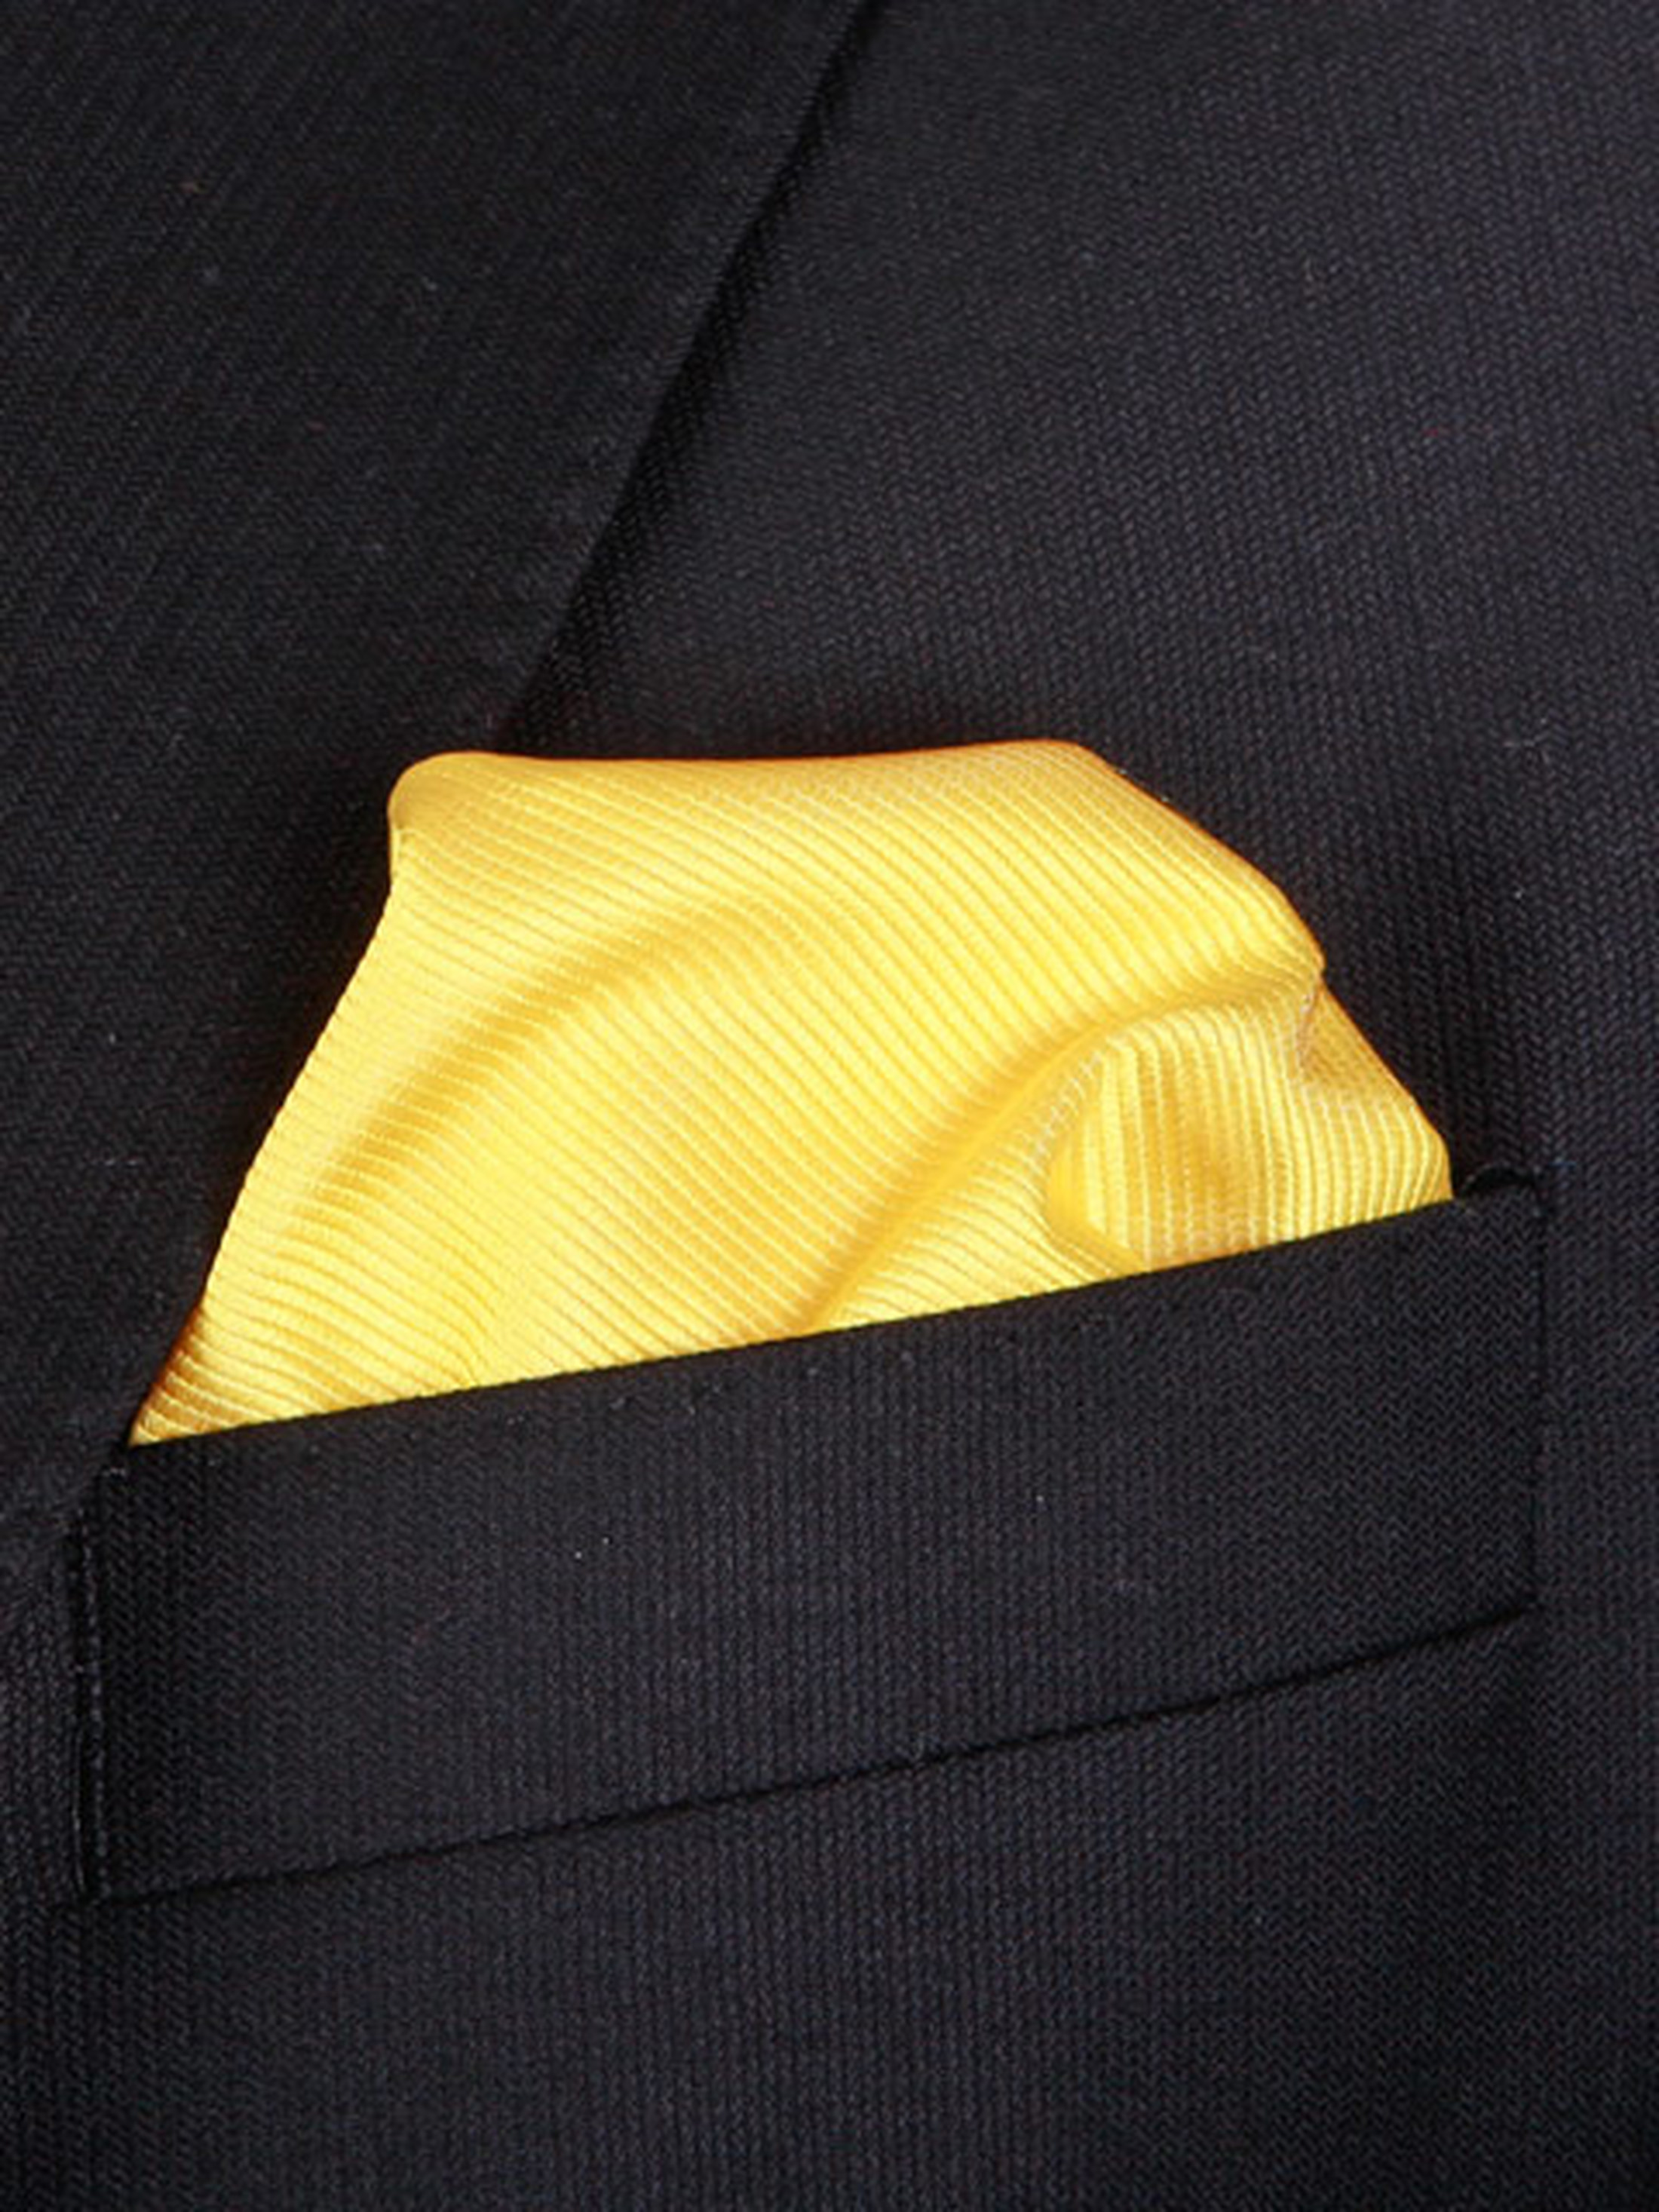 Pocket Square Yellow F70 photo 1